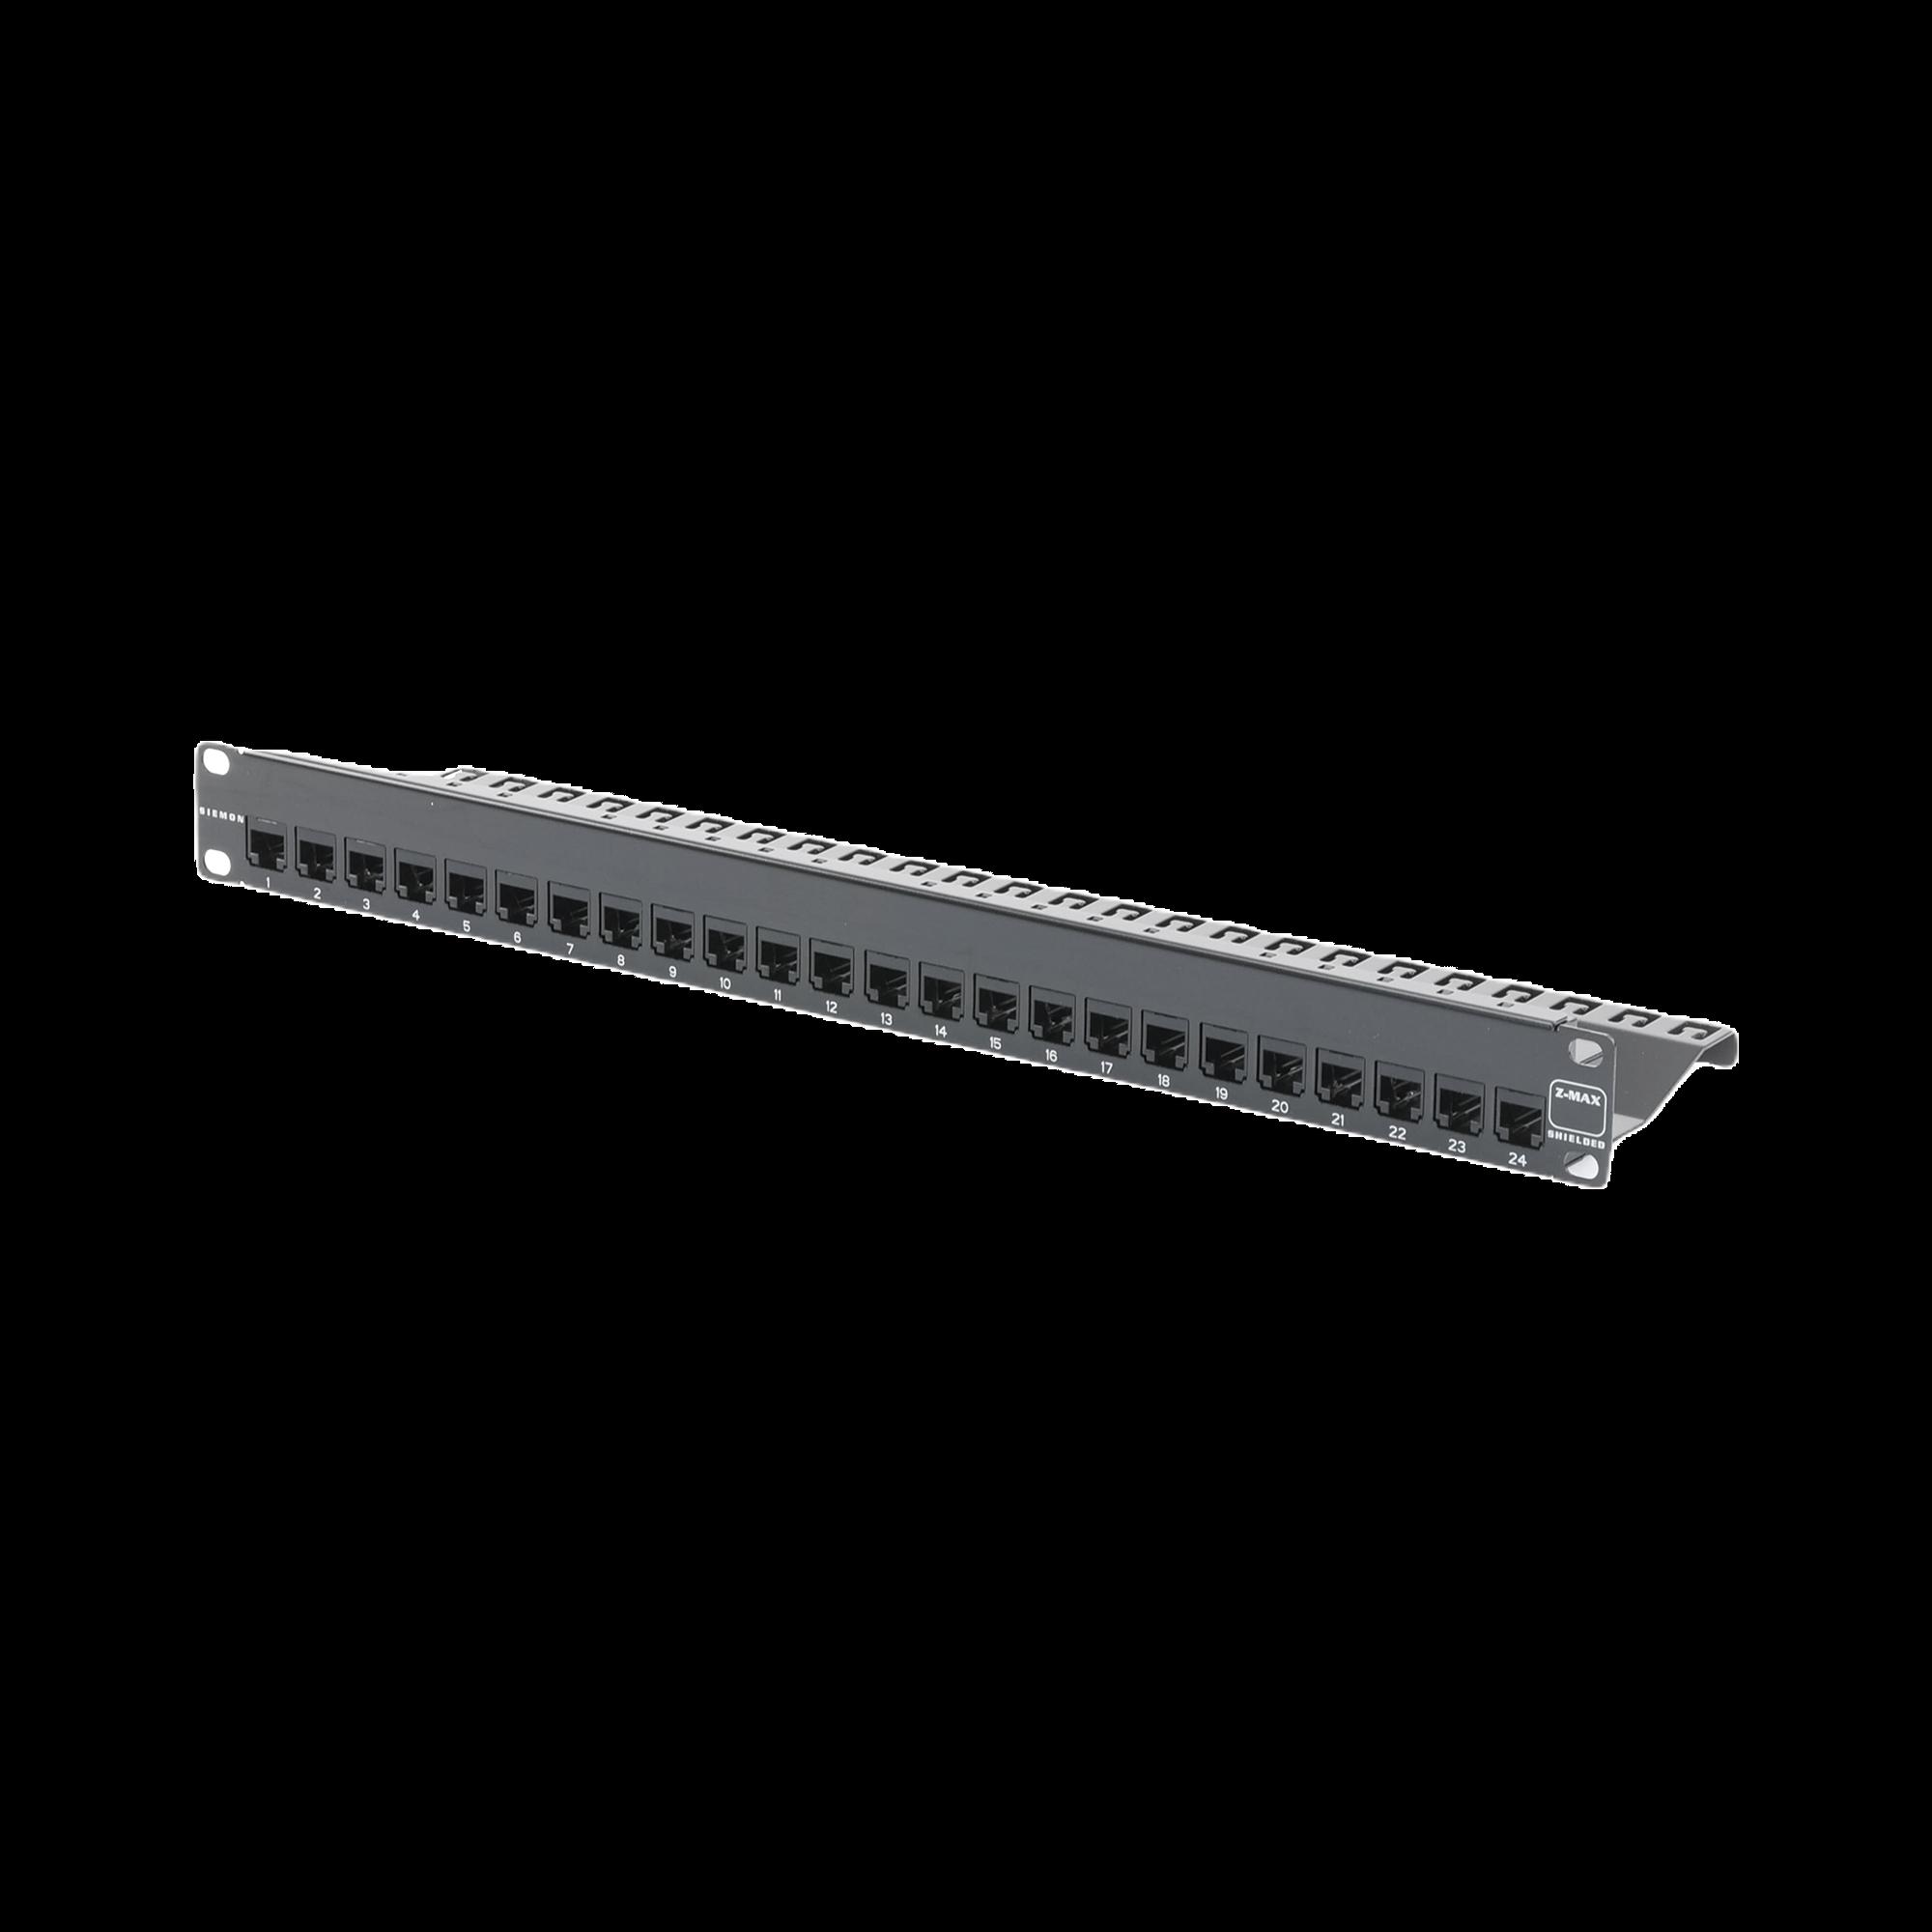 Patch Panel Z-MAX, Blindado, de 24 puertos, Modular, Plano, 1UR